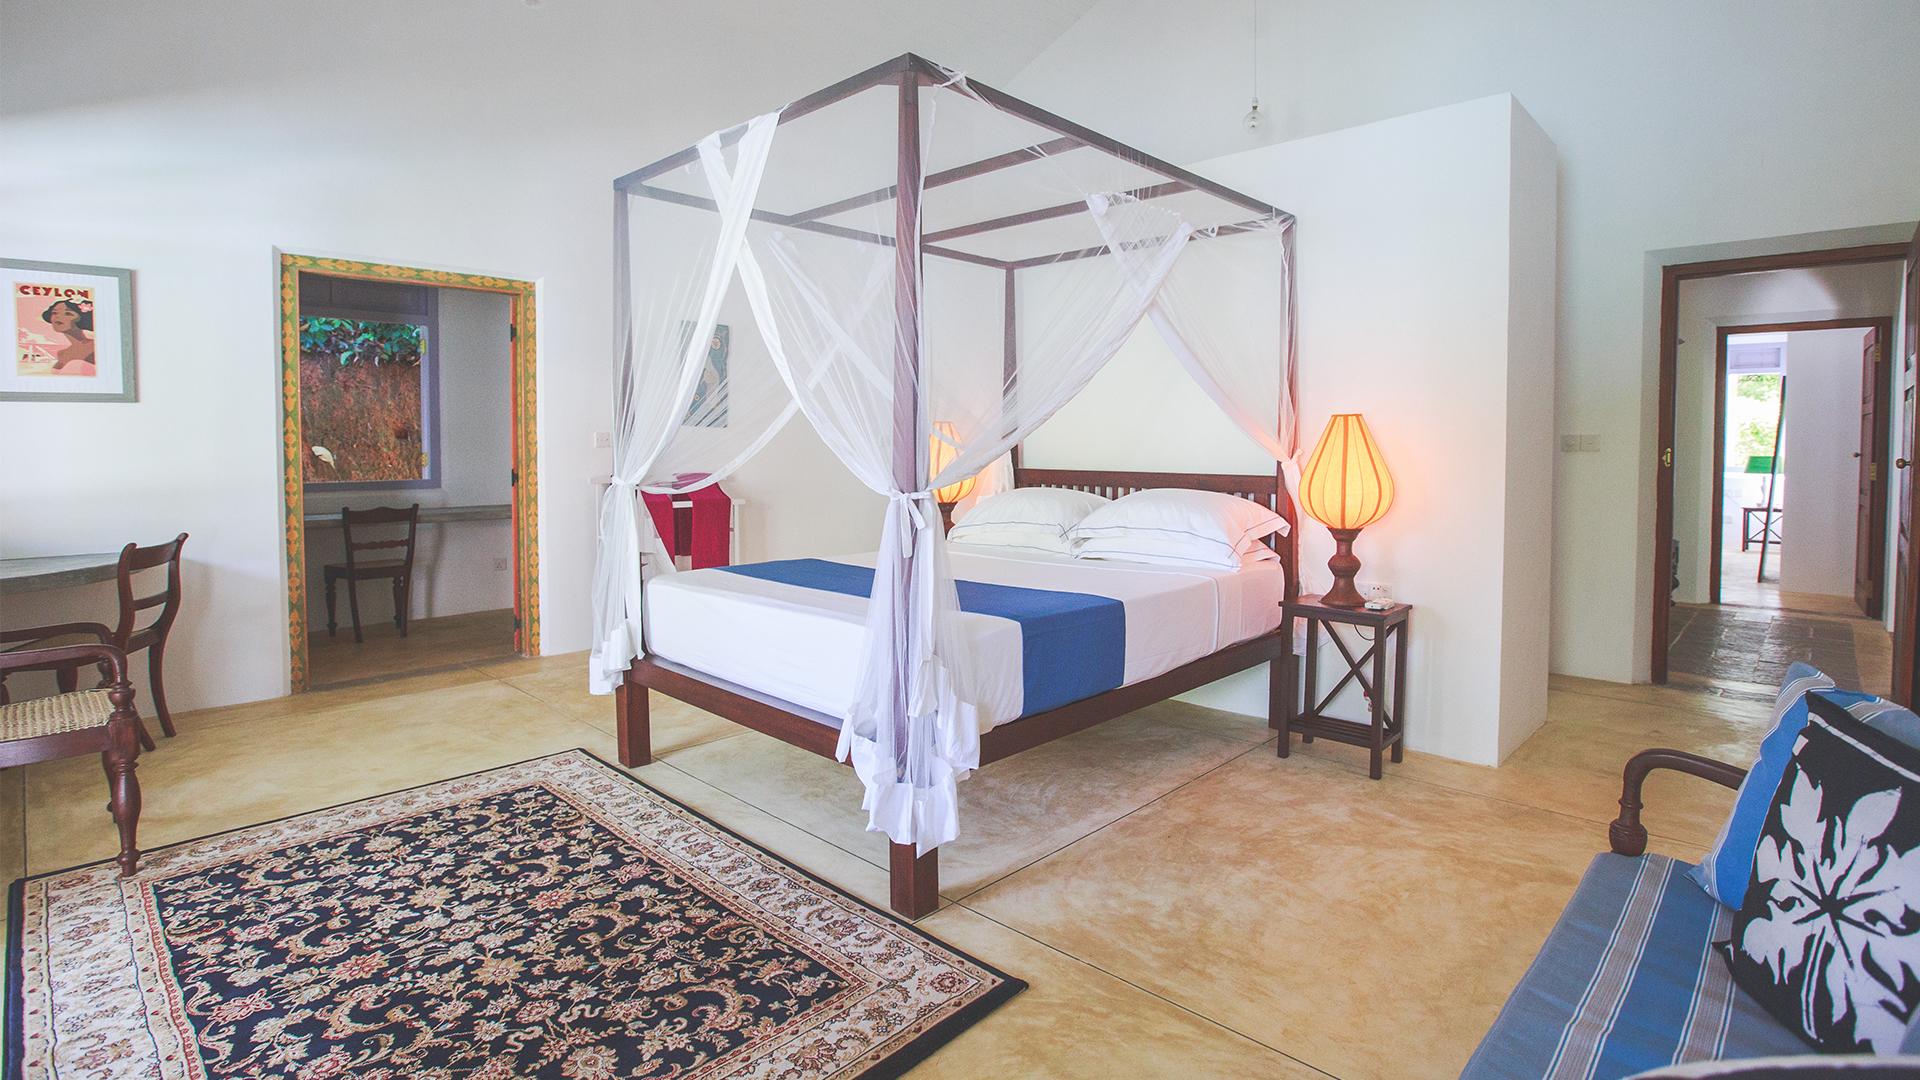 thalduwa_villas_sri_lanka_english_holiday_destination_villa_vadorArtboard 1.jpg